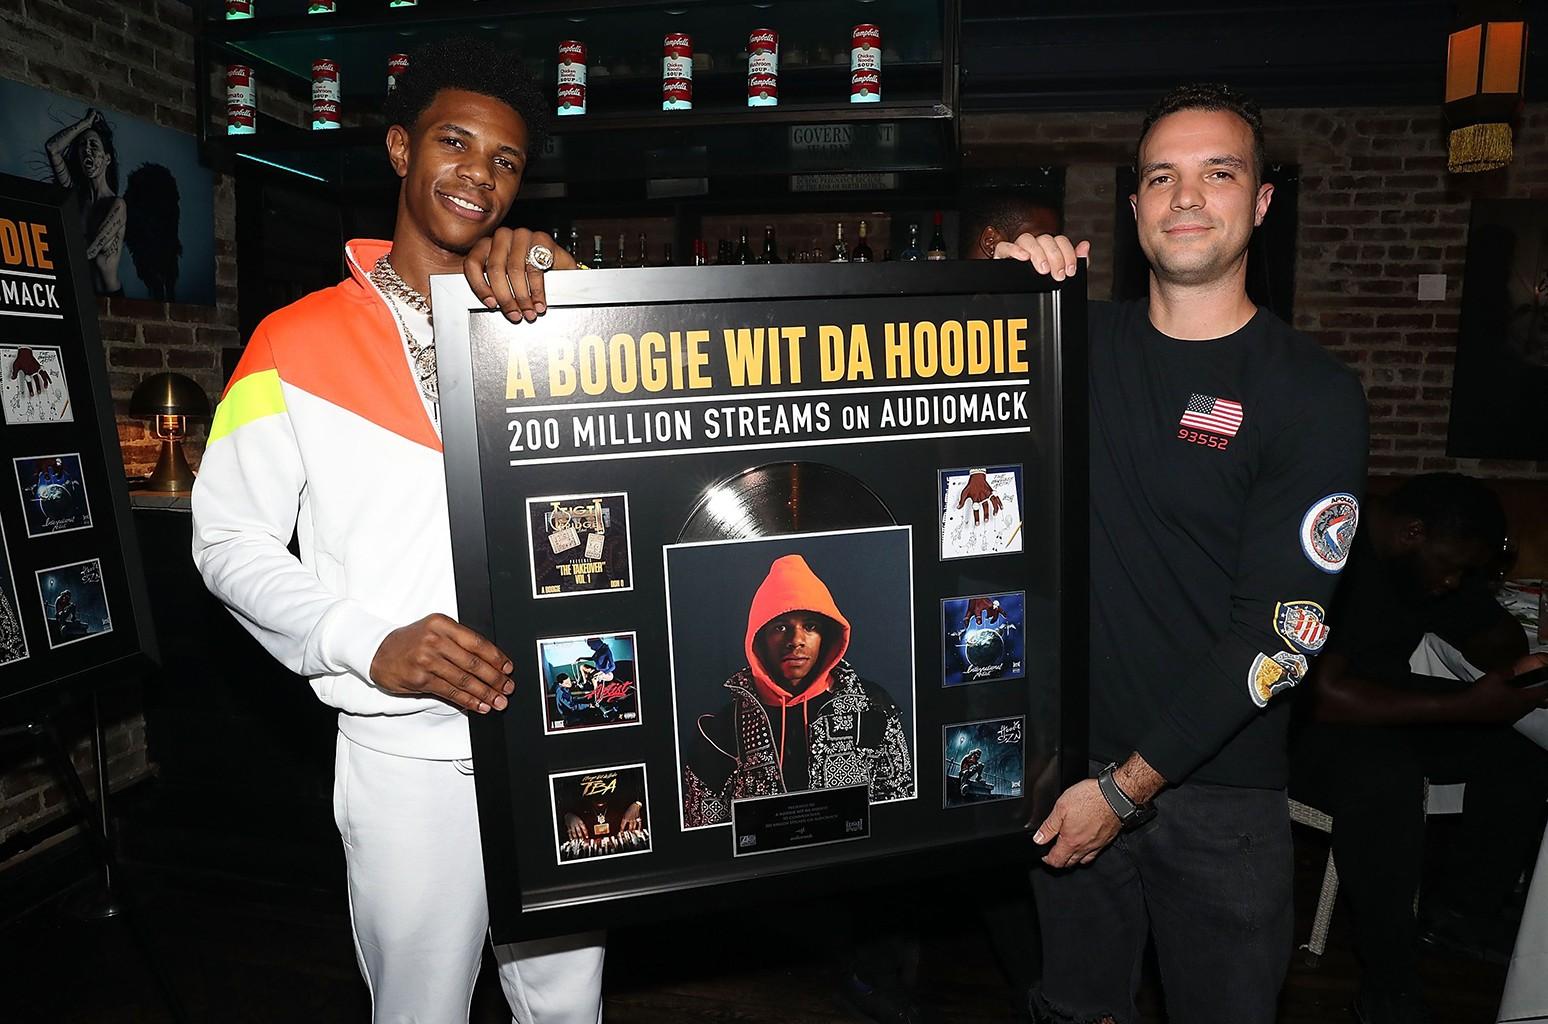 A Boogie Wit Da Hoodie and David Ponte